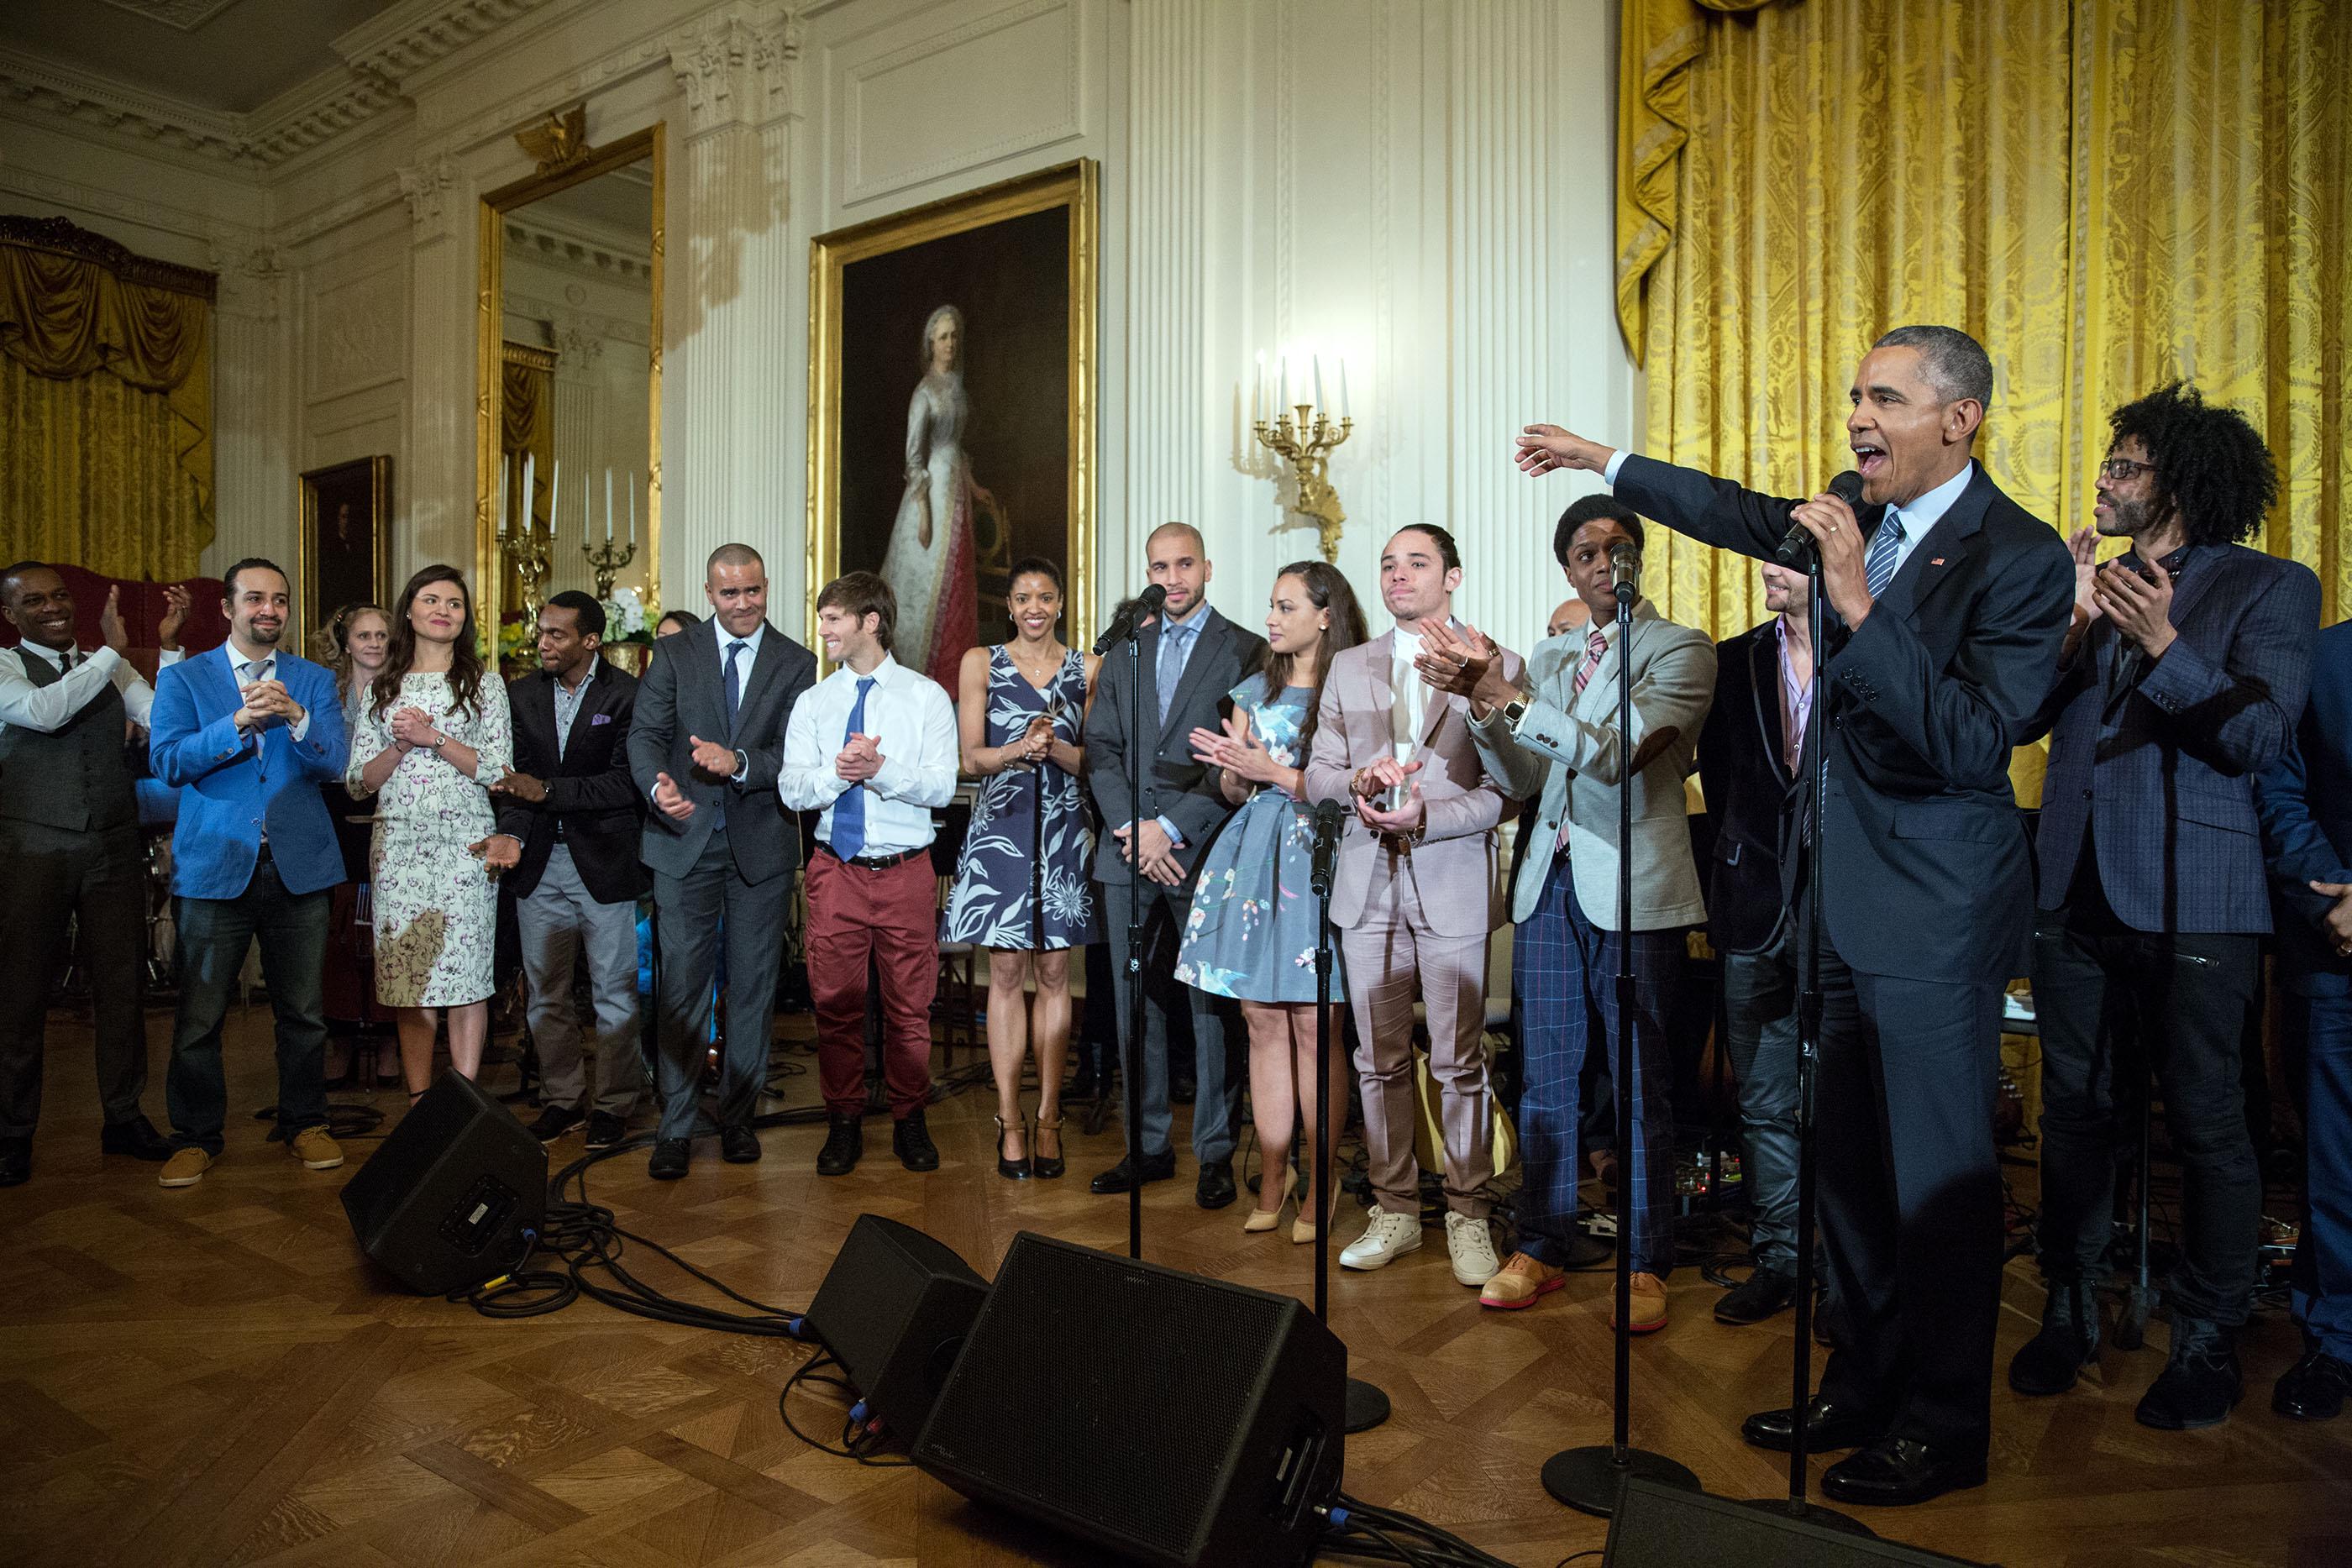 bam4ham: hamilton at the white house | whitehouse.gov